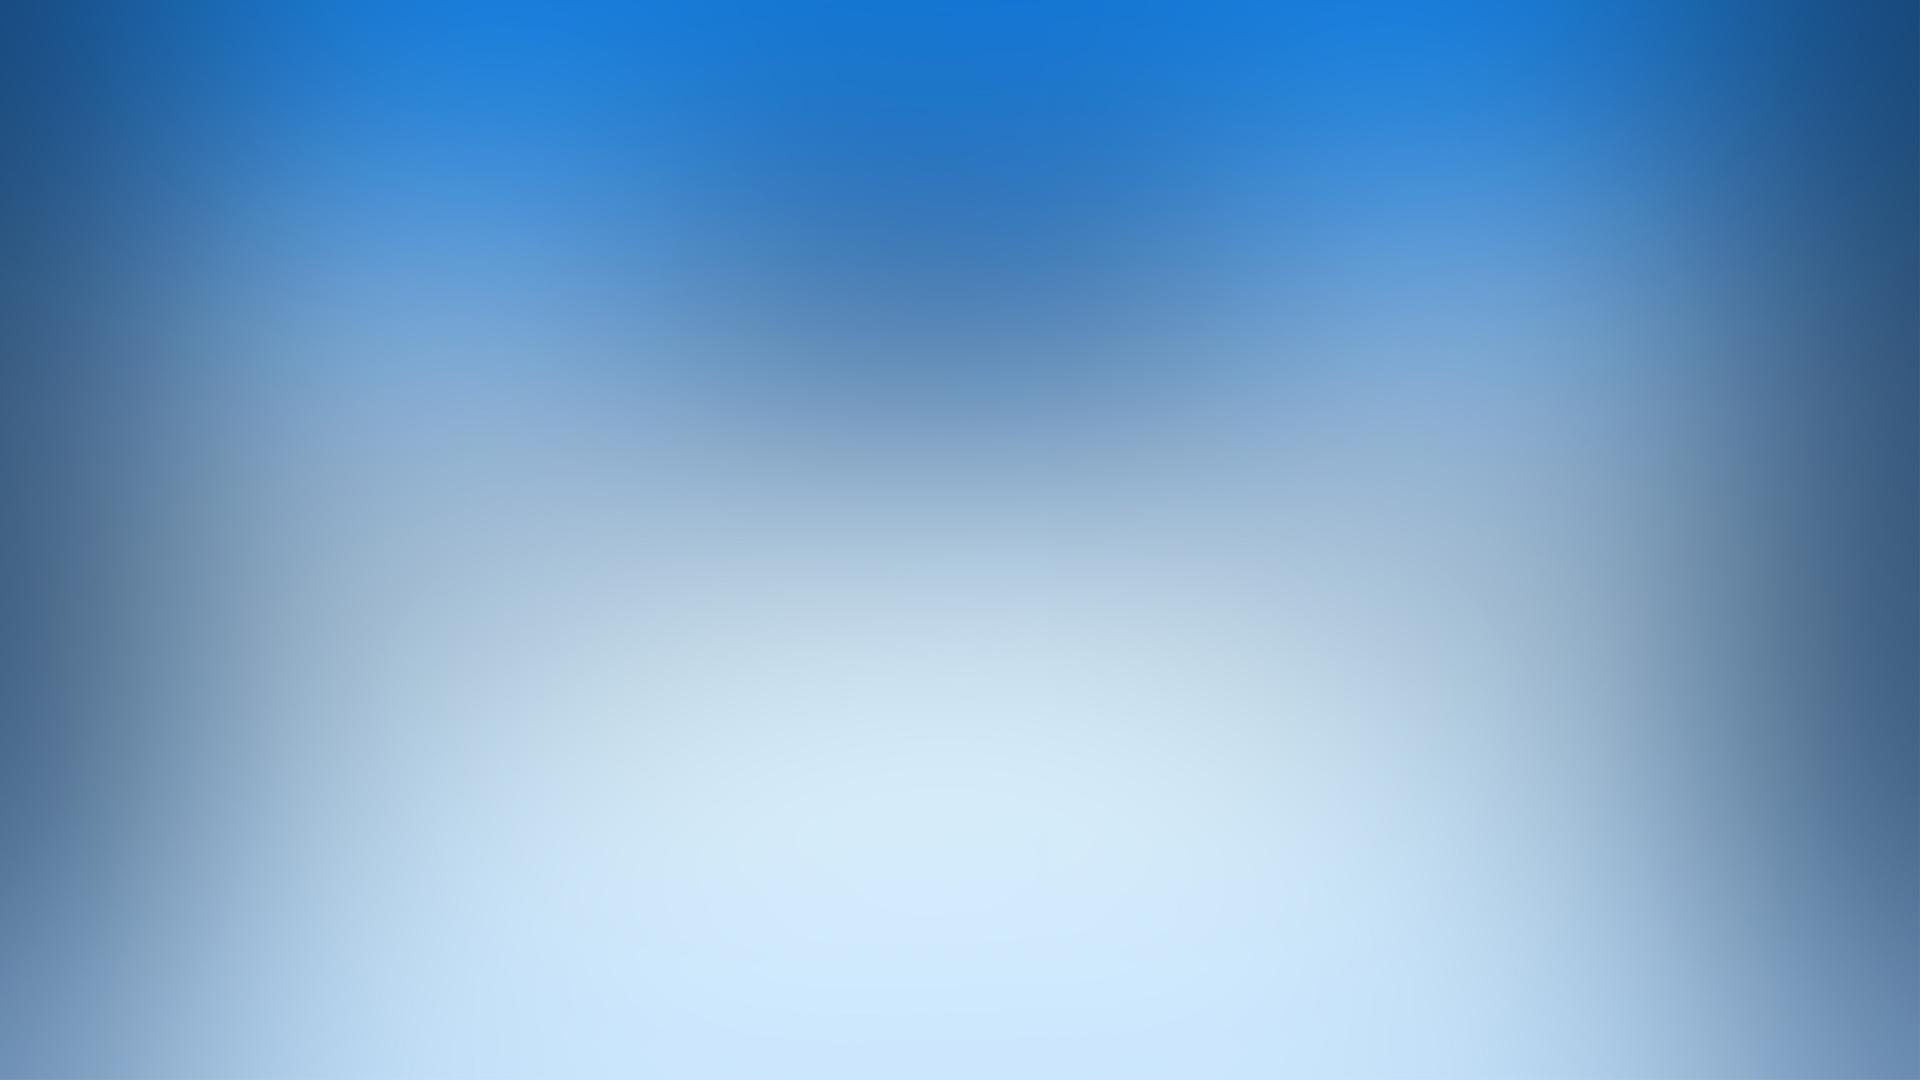 Car Wallpaper 1920x1080 Blue Mist Hd Wallpapers